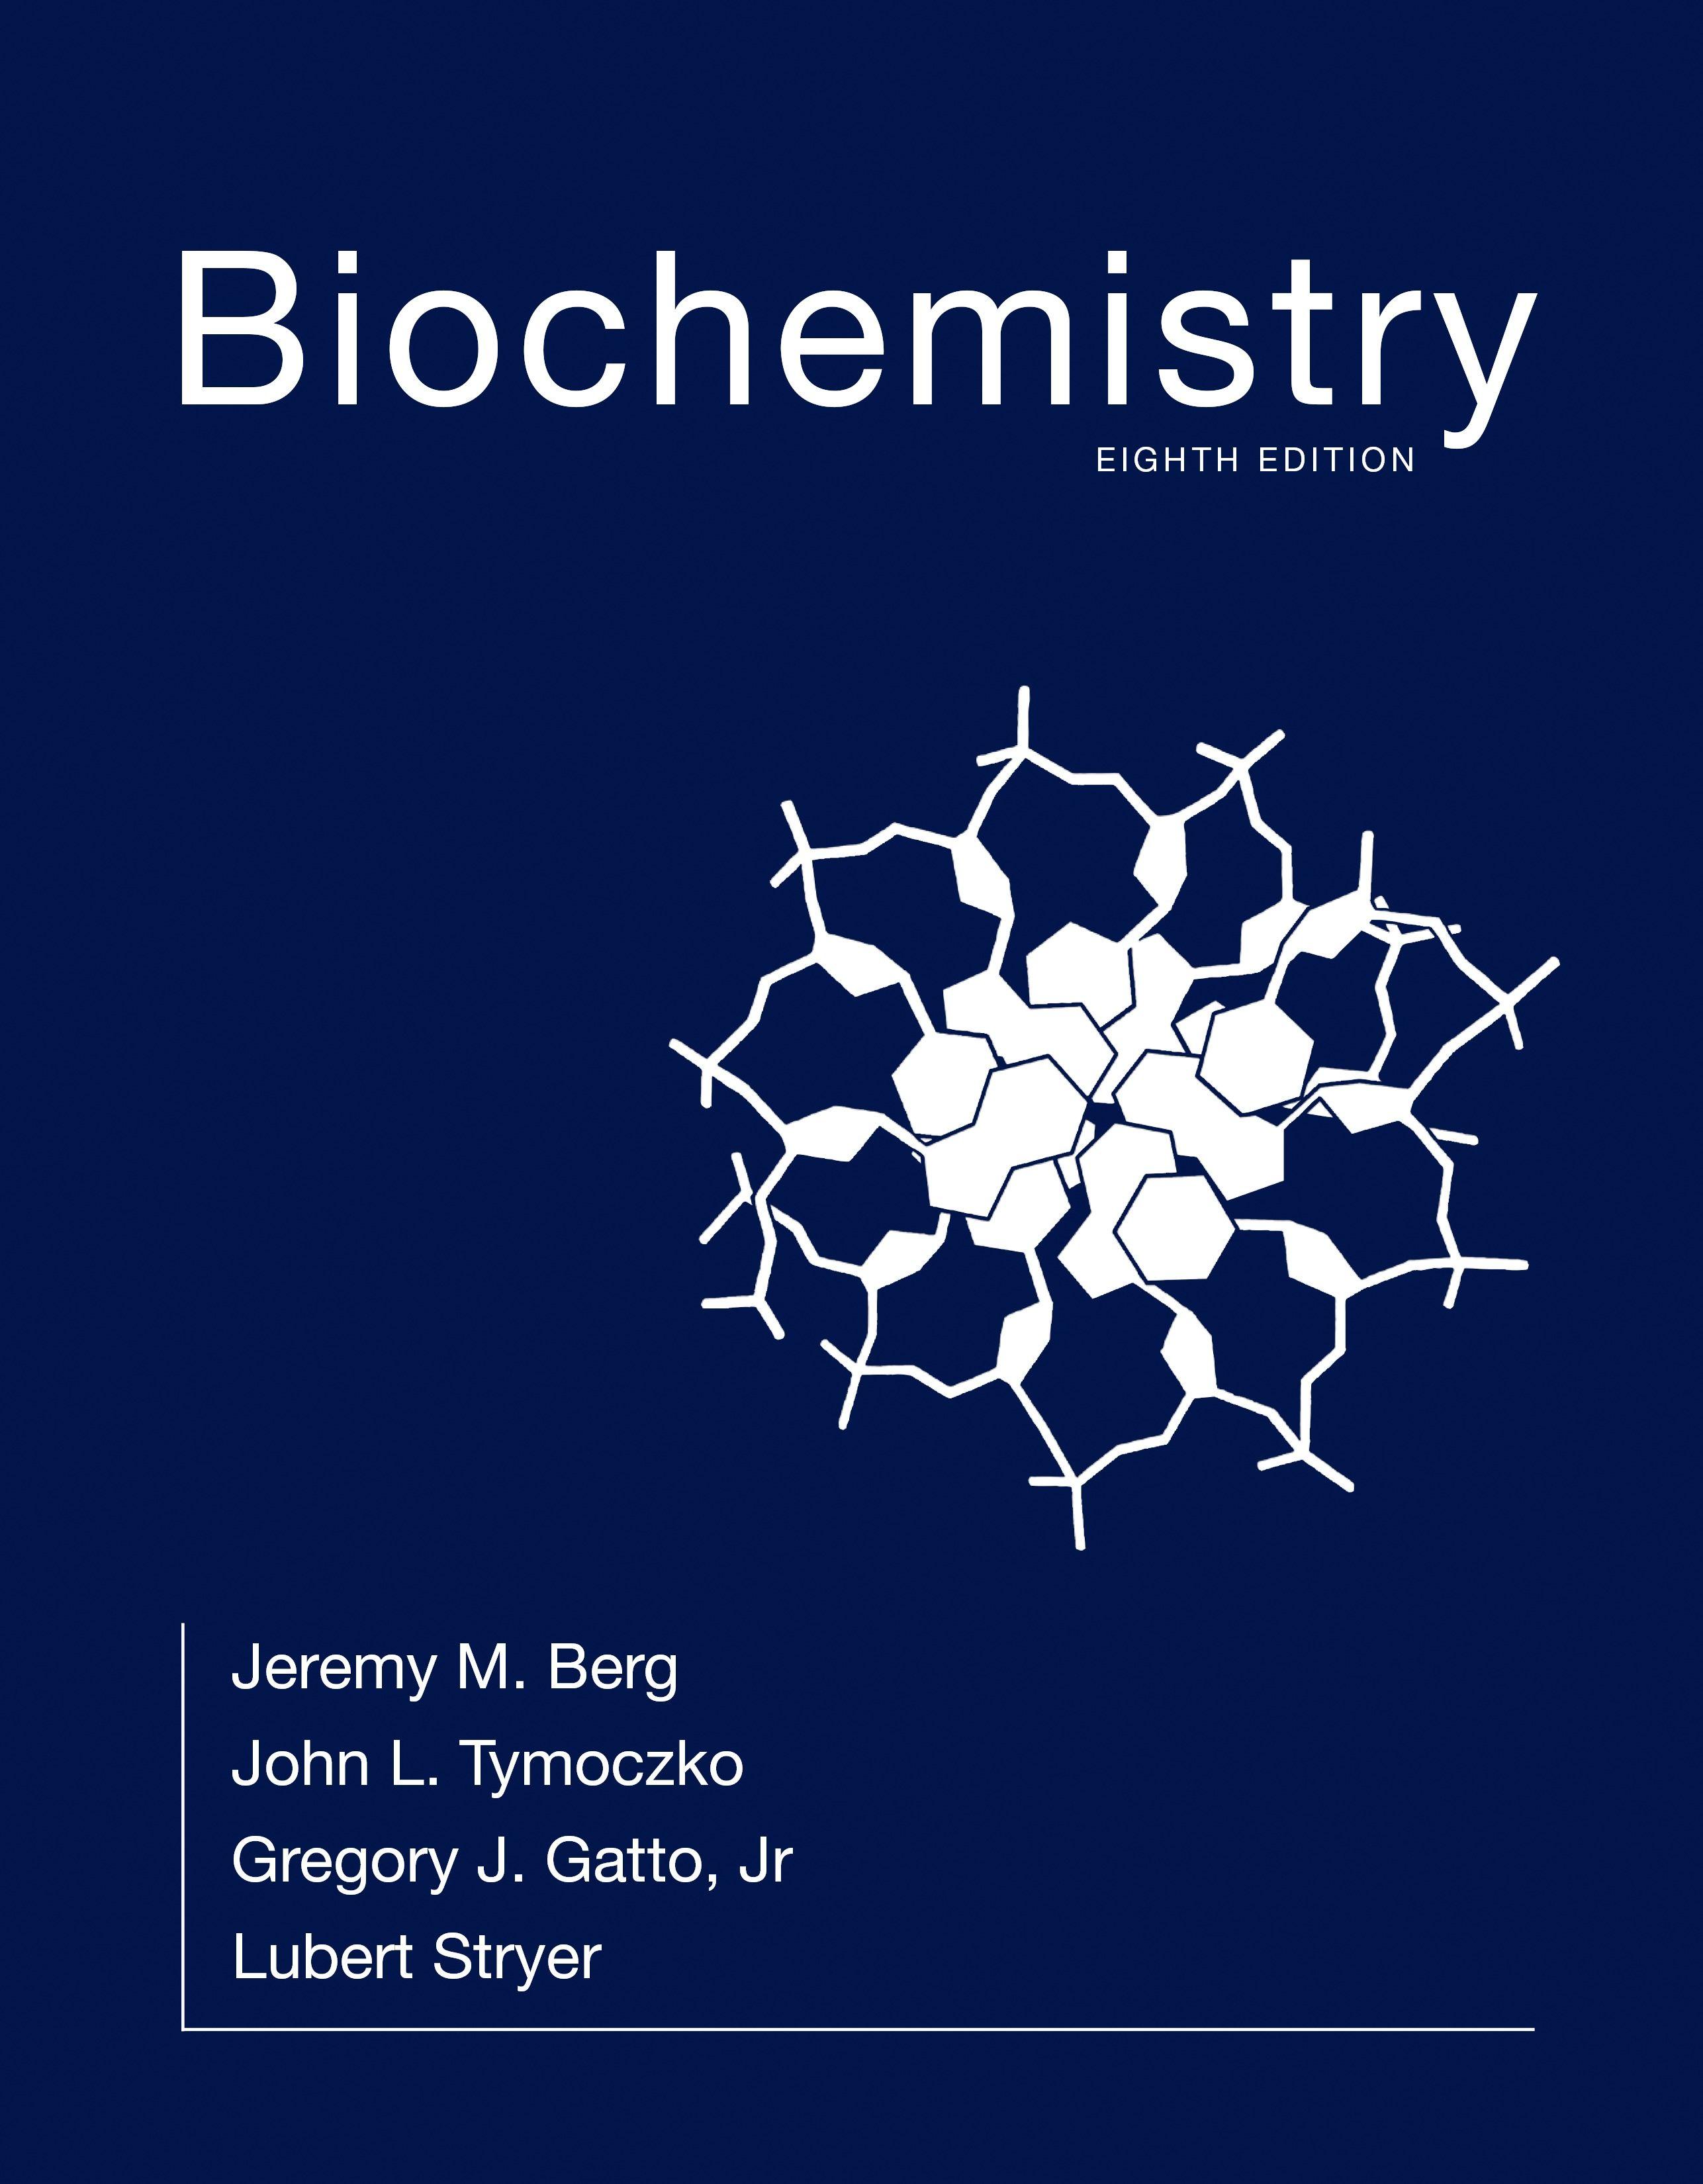 Biochemistry 8th Ed Jeremy M Berg John L Tymoczko Gregory J Gatto Jr Lubert Stryer New York W H Freeman Cop 2015 Matèries Bioquímica N